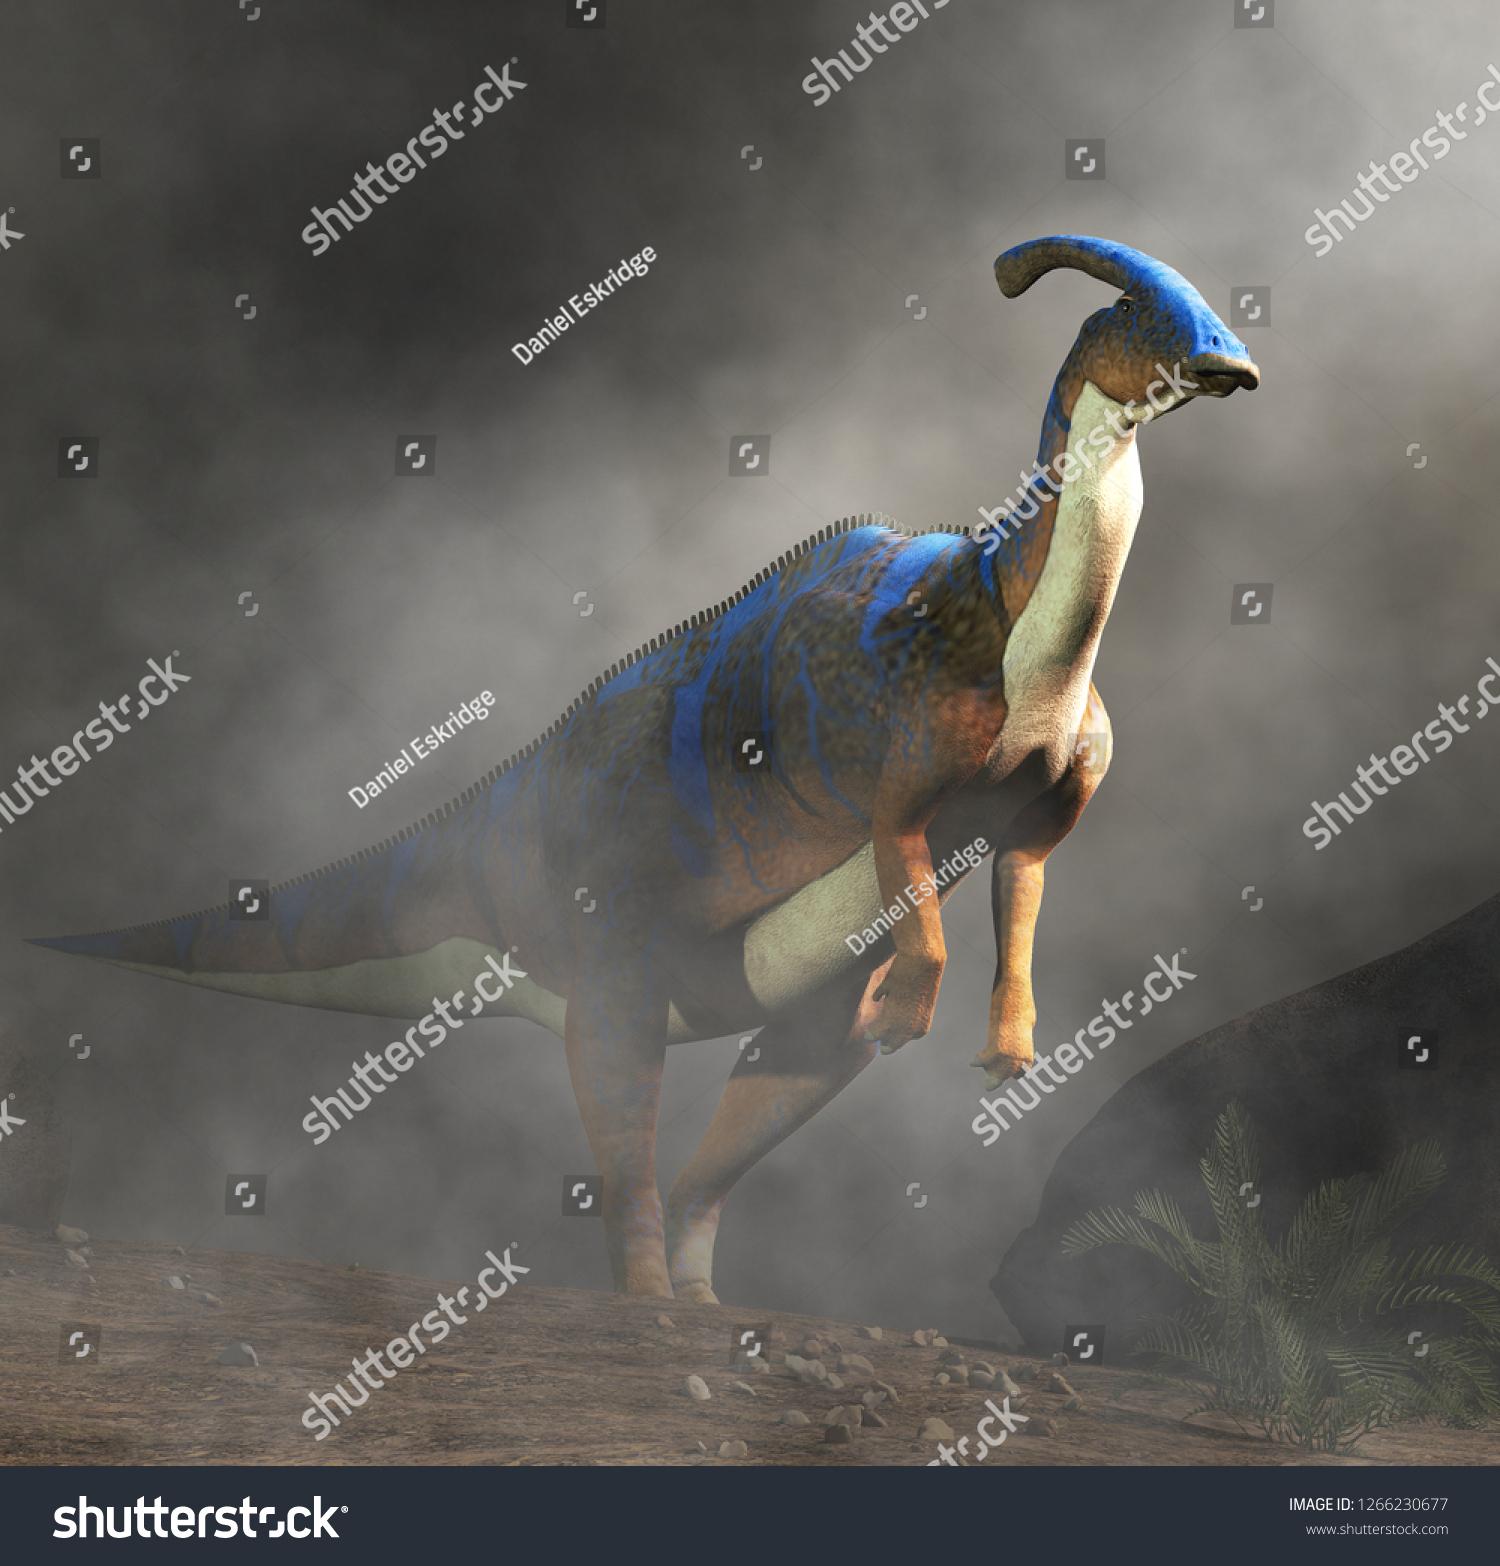 Parasaurolophus Type Herbivorous Ornithopod Dinosaur Hadrosaur Stock